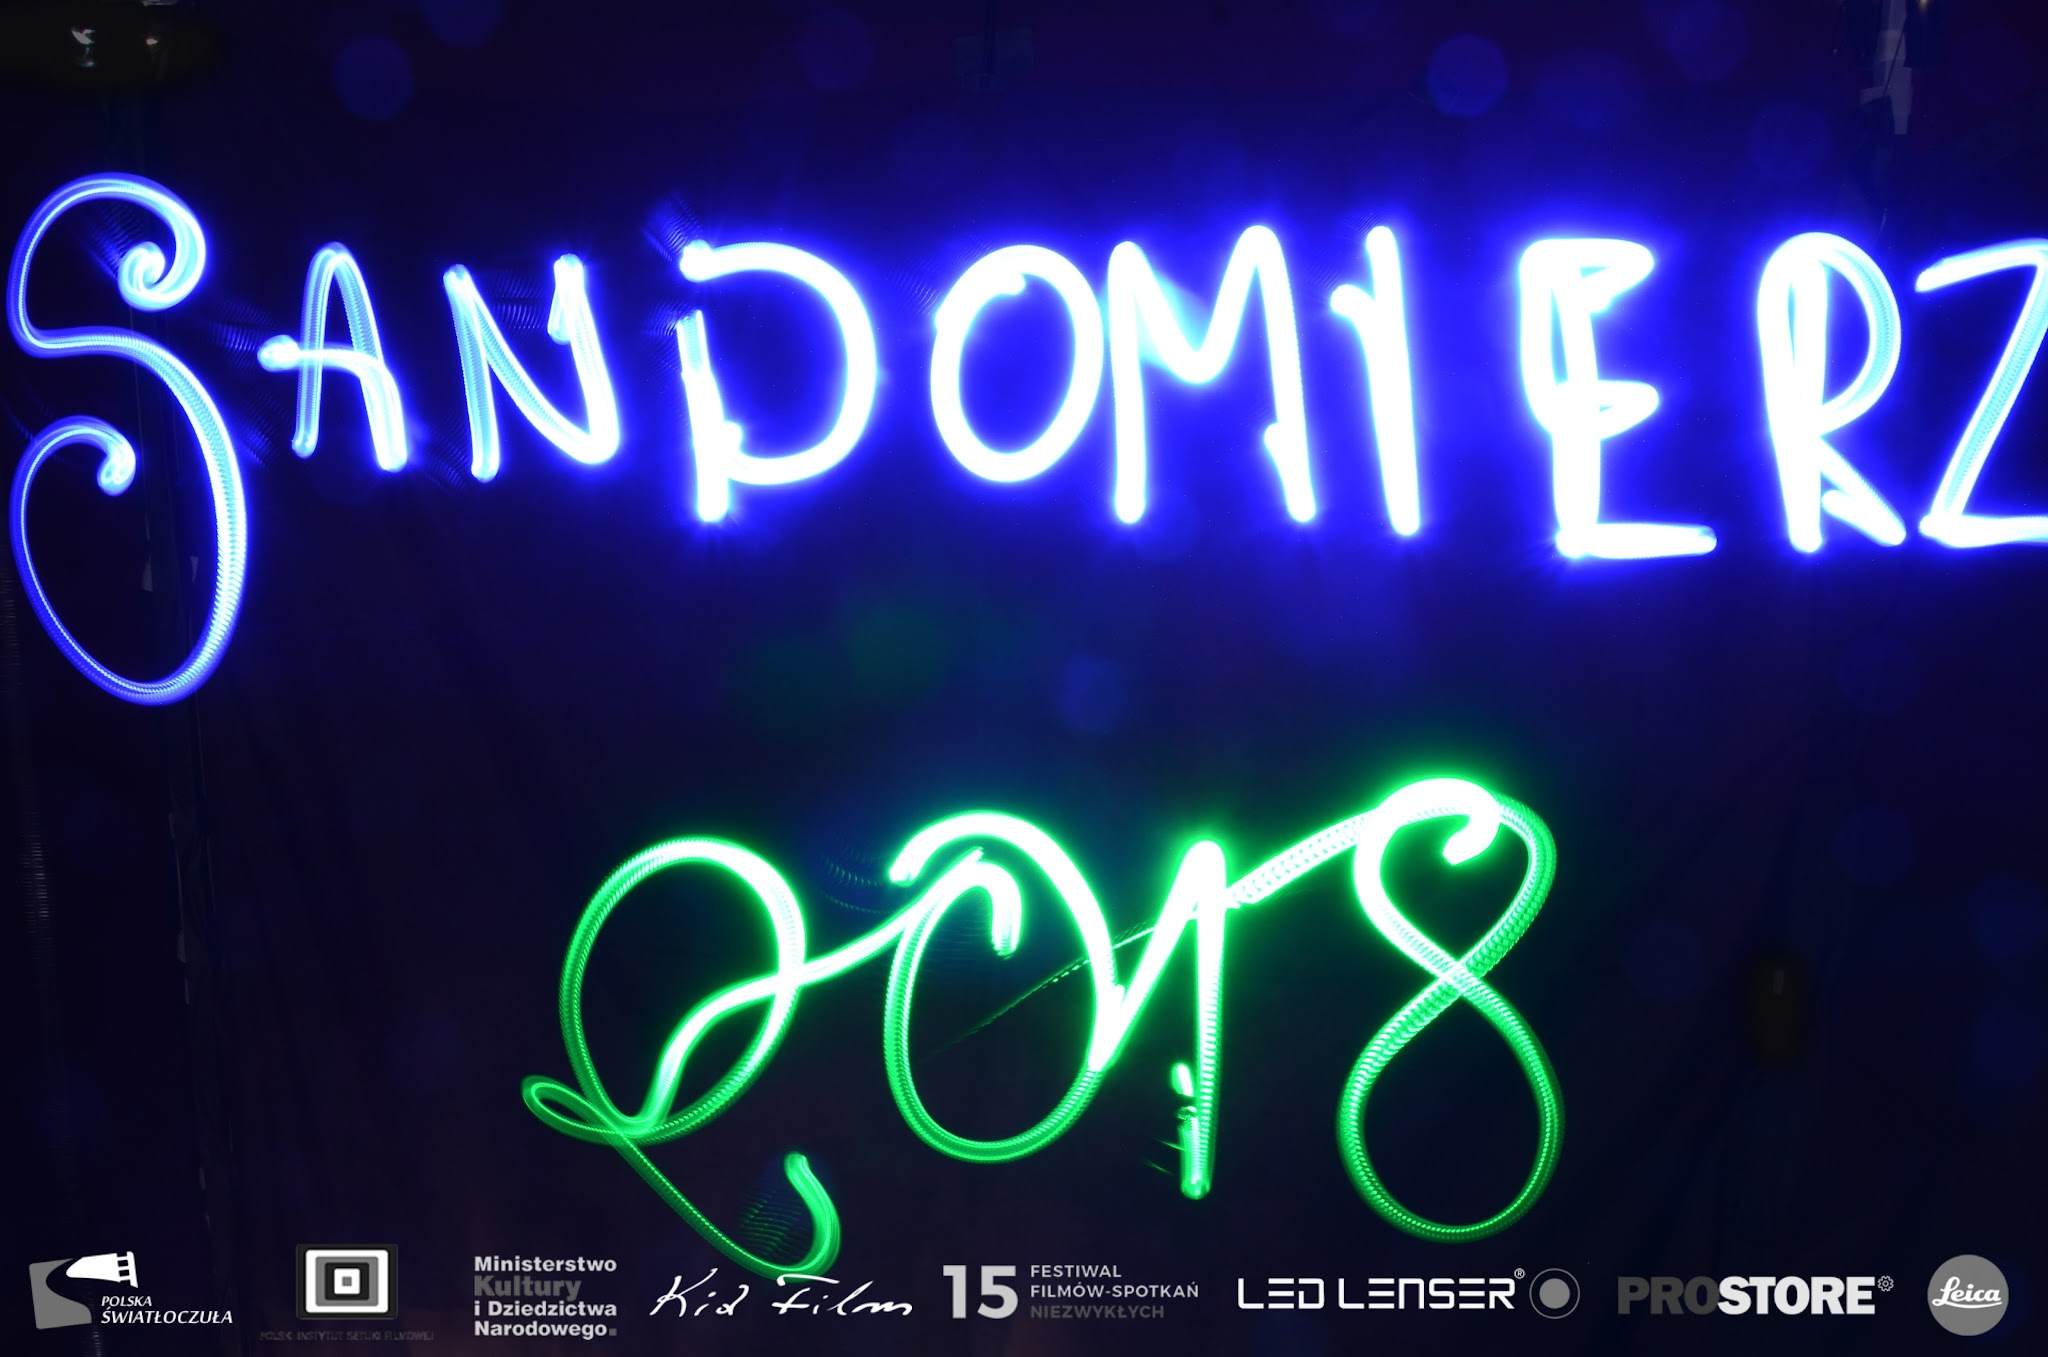 Sandomierz 2018